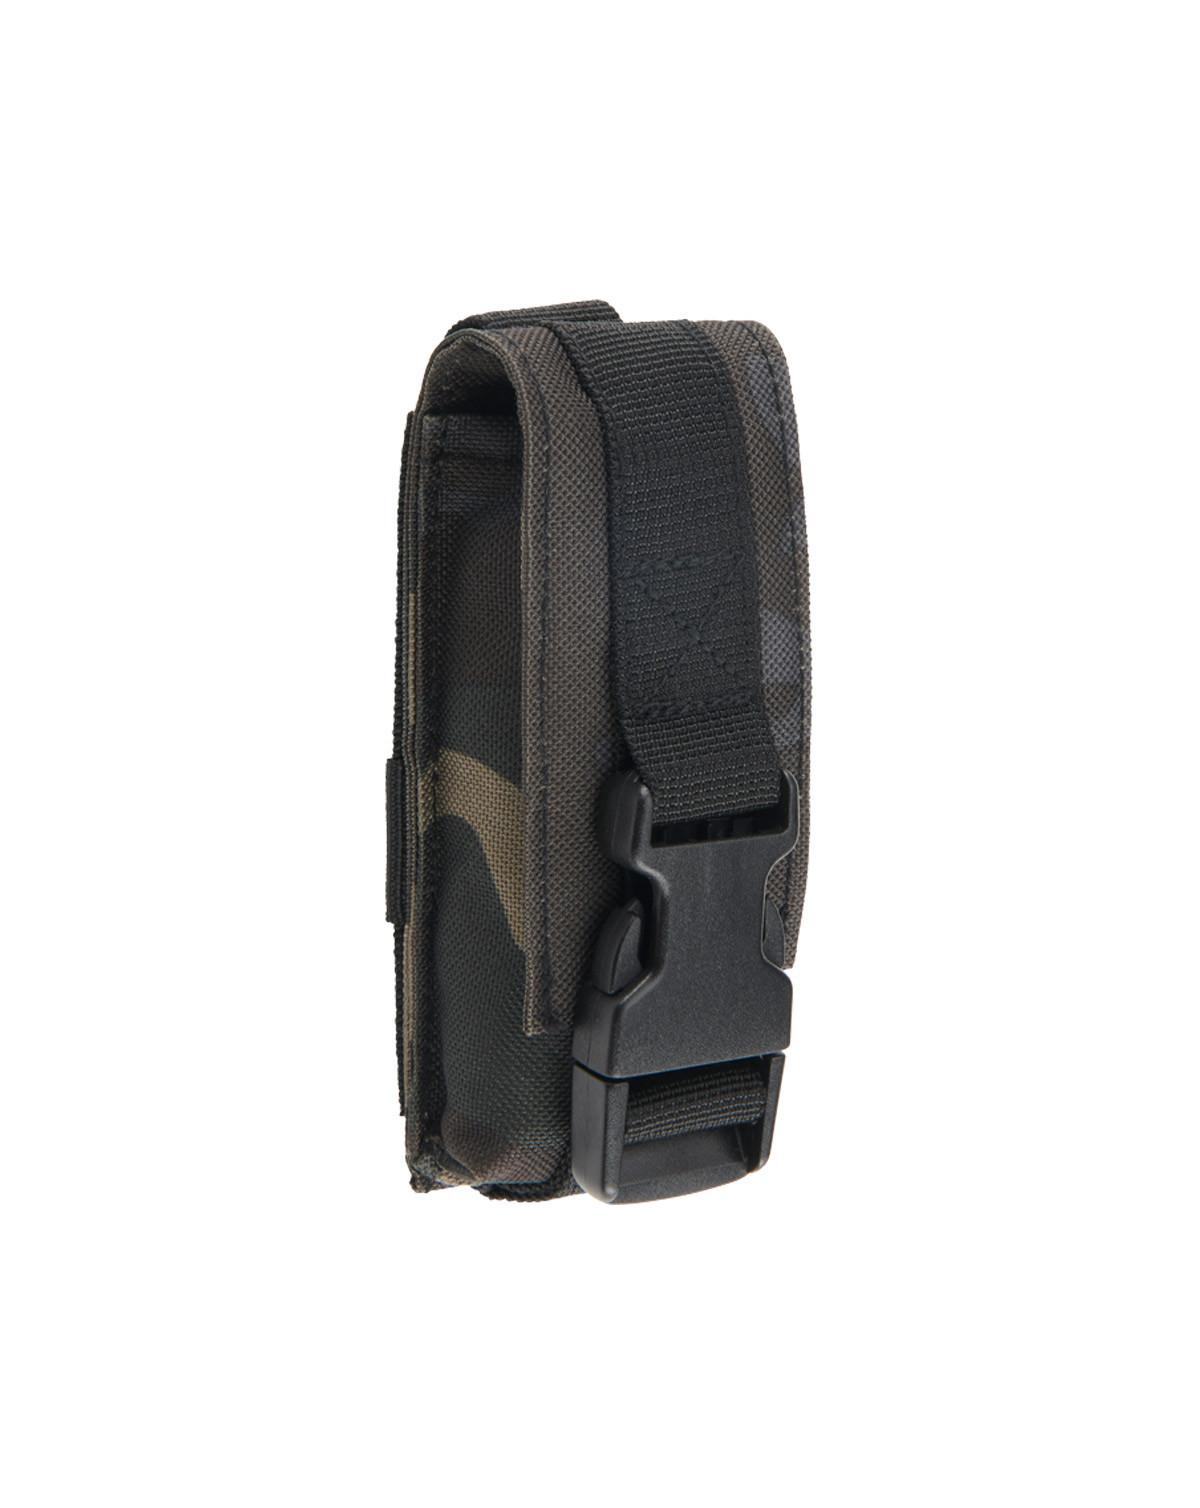 Image of   Brandit Molle Multi Pouch Medium (Dark Camo, One Size)